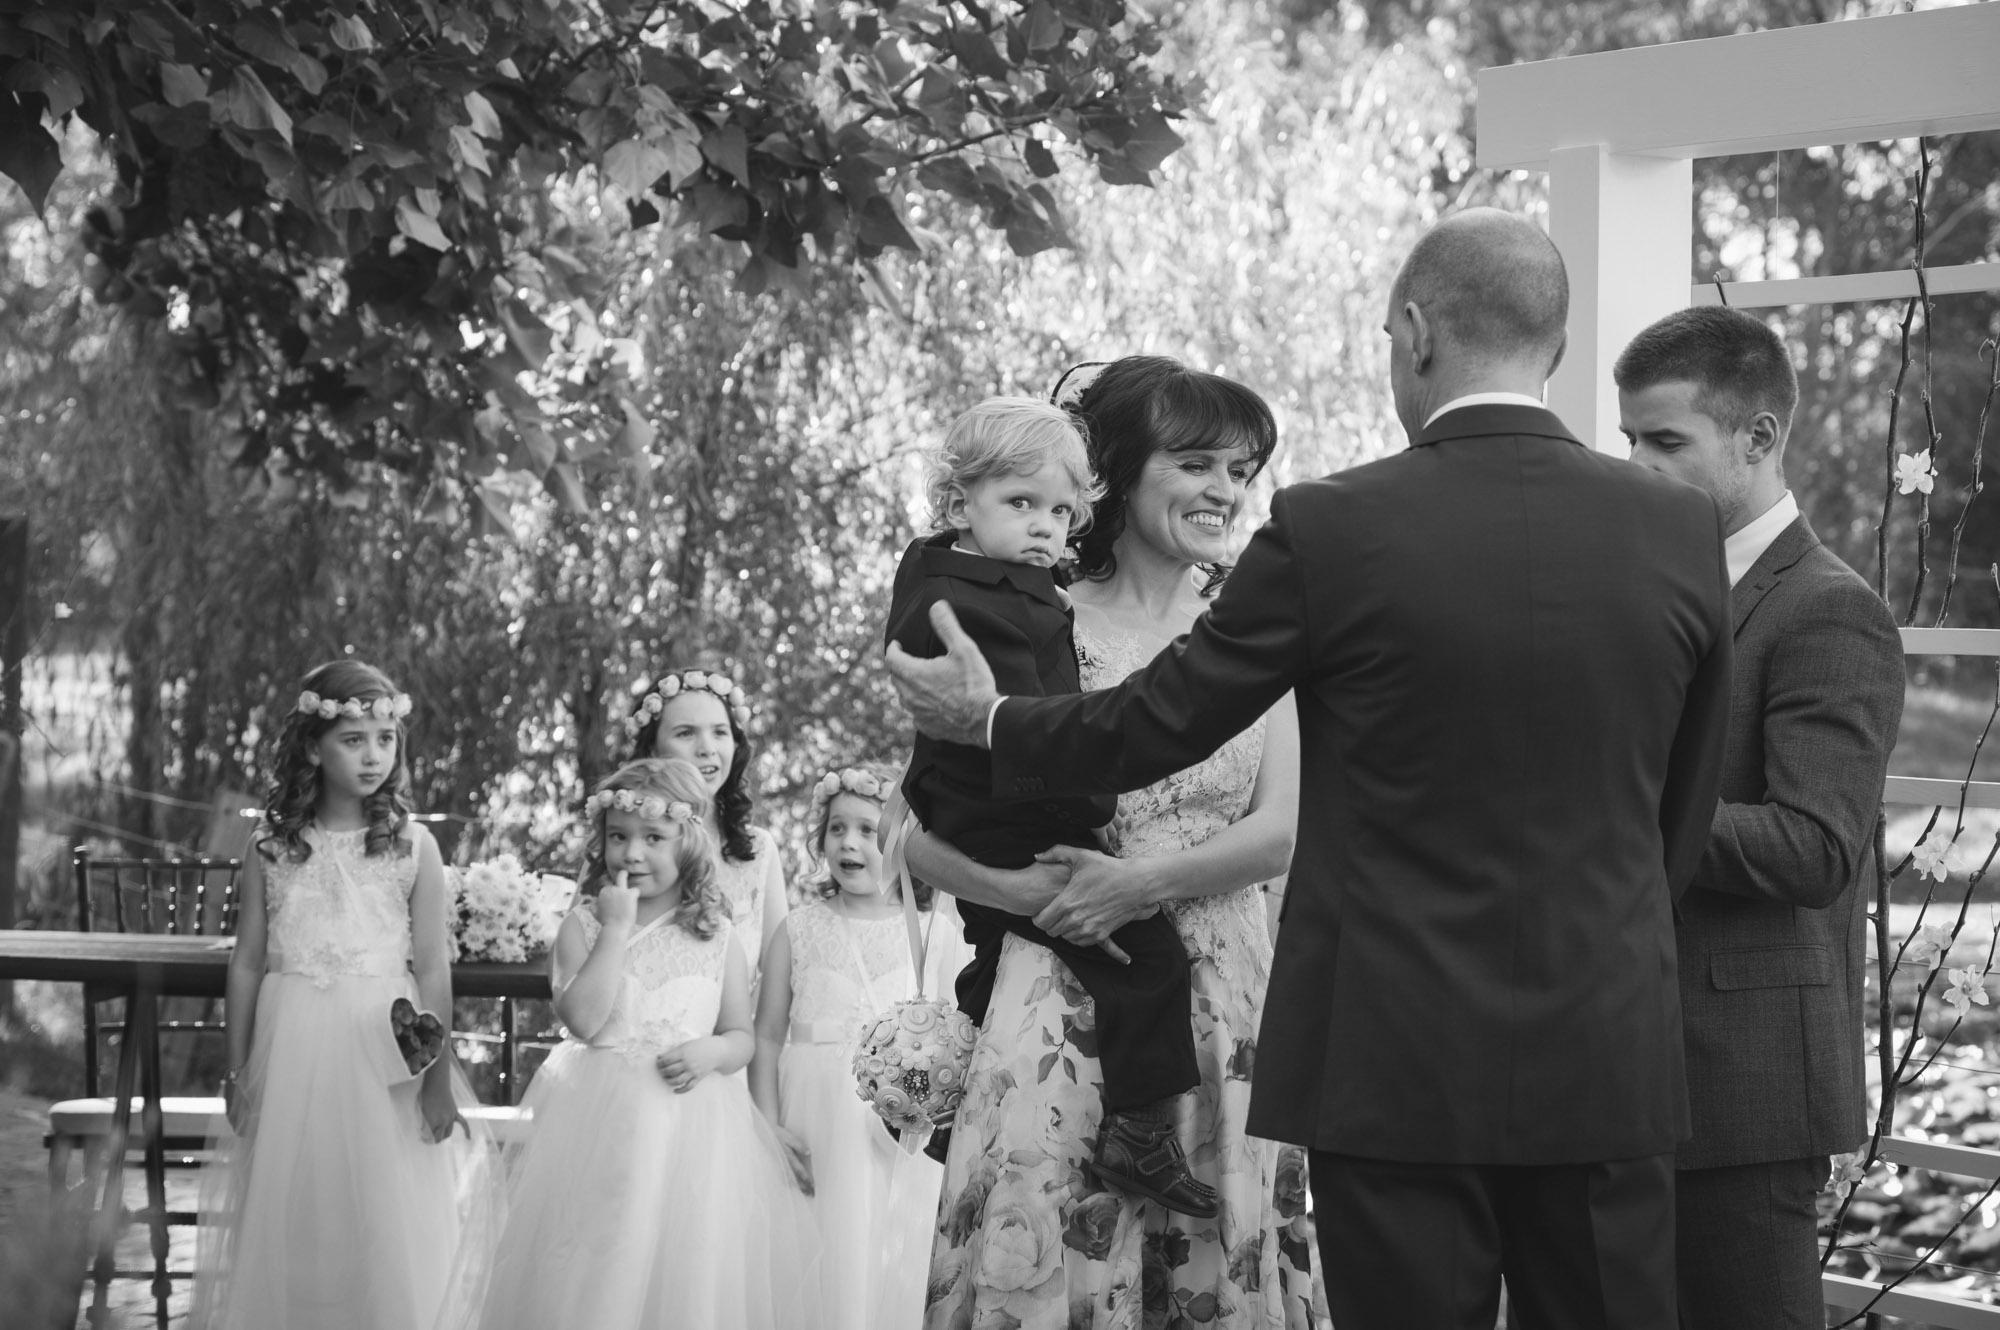 Angie-Roe-Photography-Wedding-Perth-Northam-Wheatbelt-Country-Rural (18).jpg